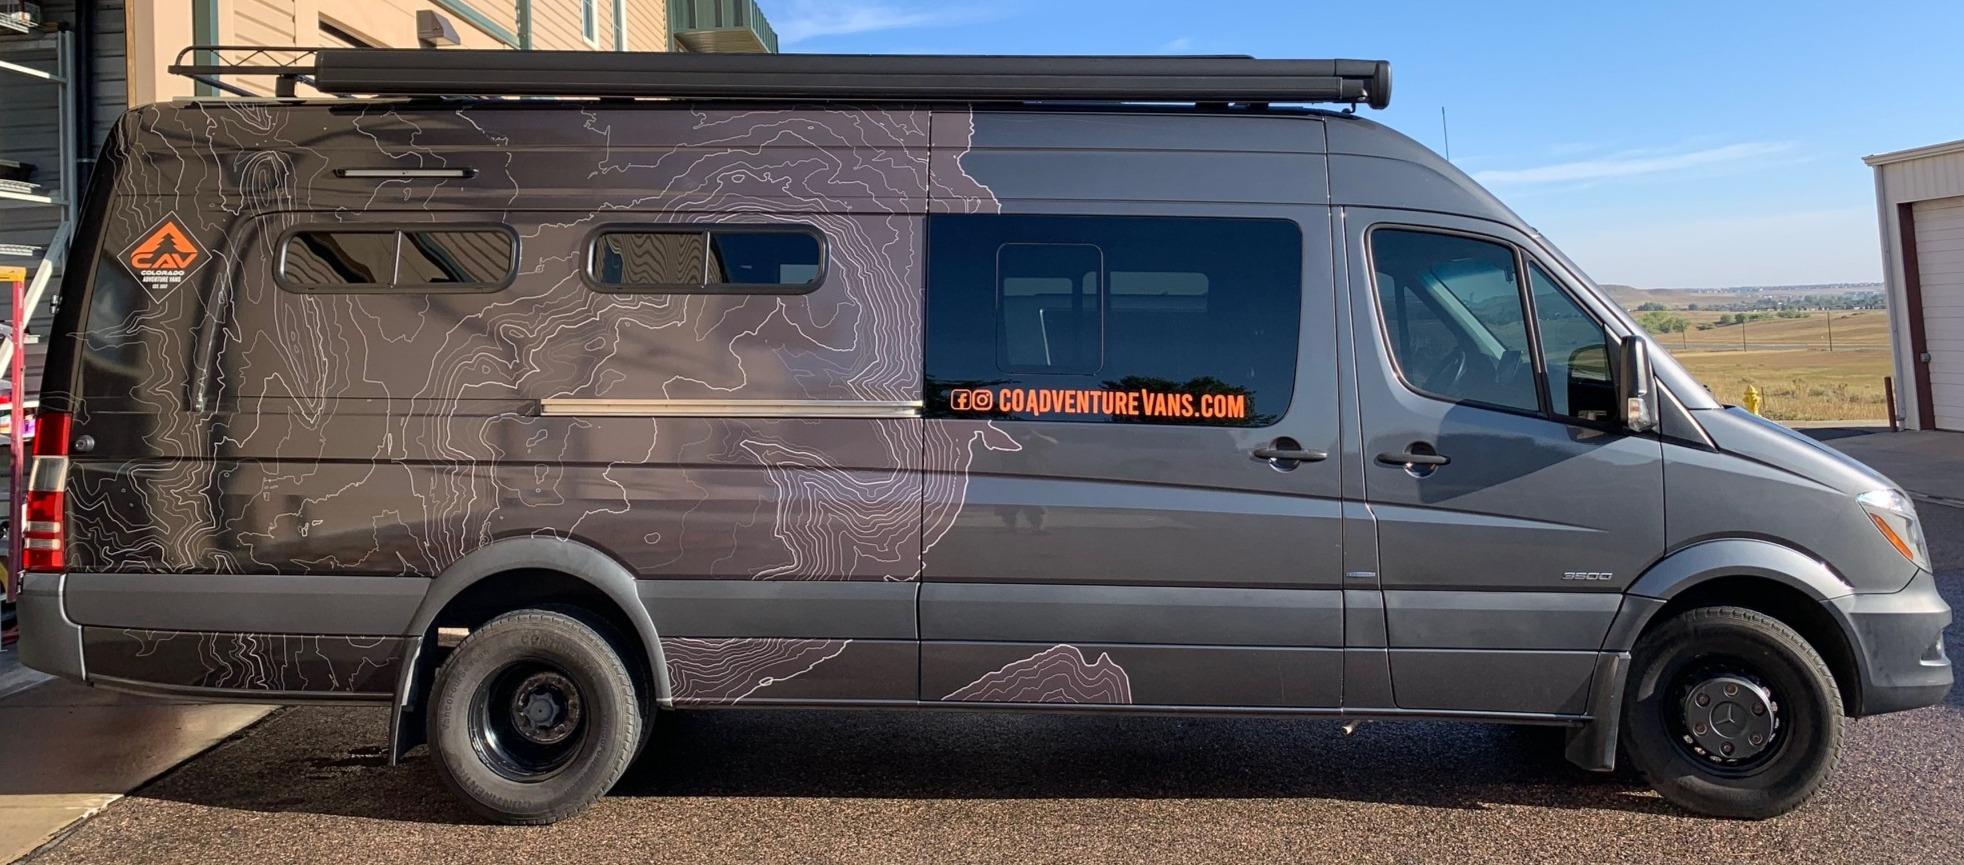 Passenger Side exterior. Mercedes-Benz Sprinter RV Motorhome Campervan 2016